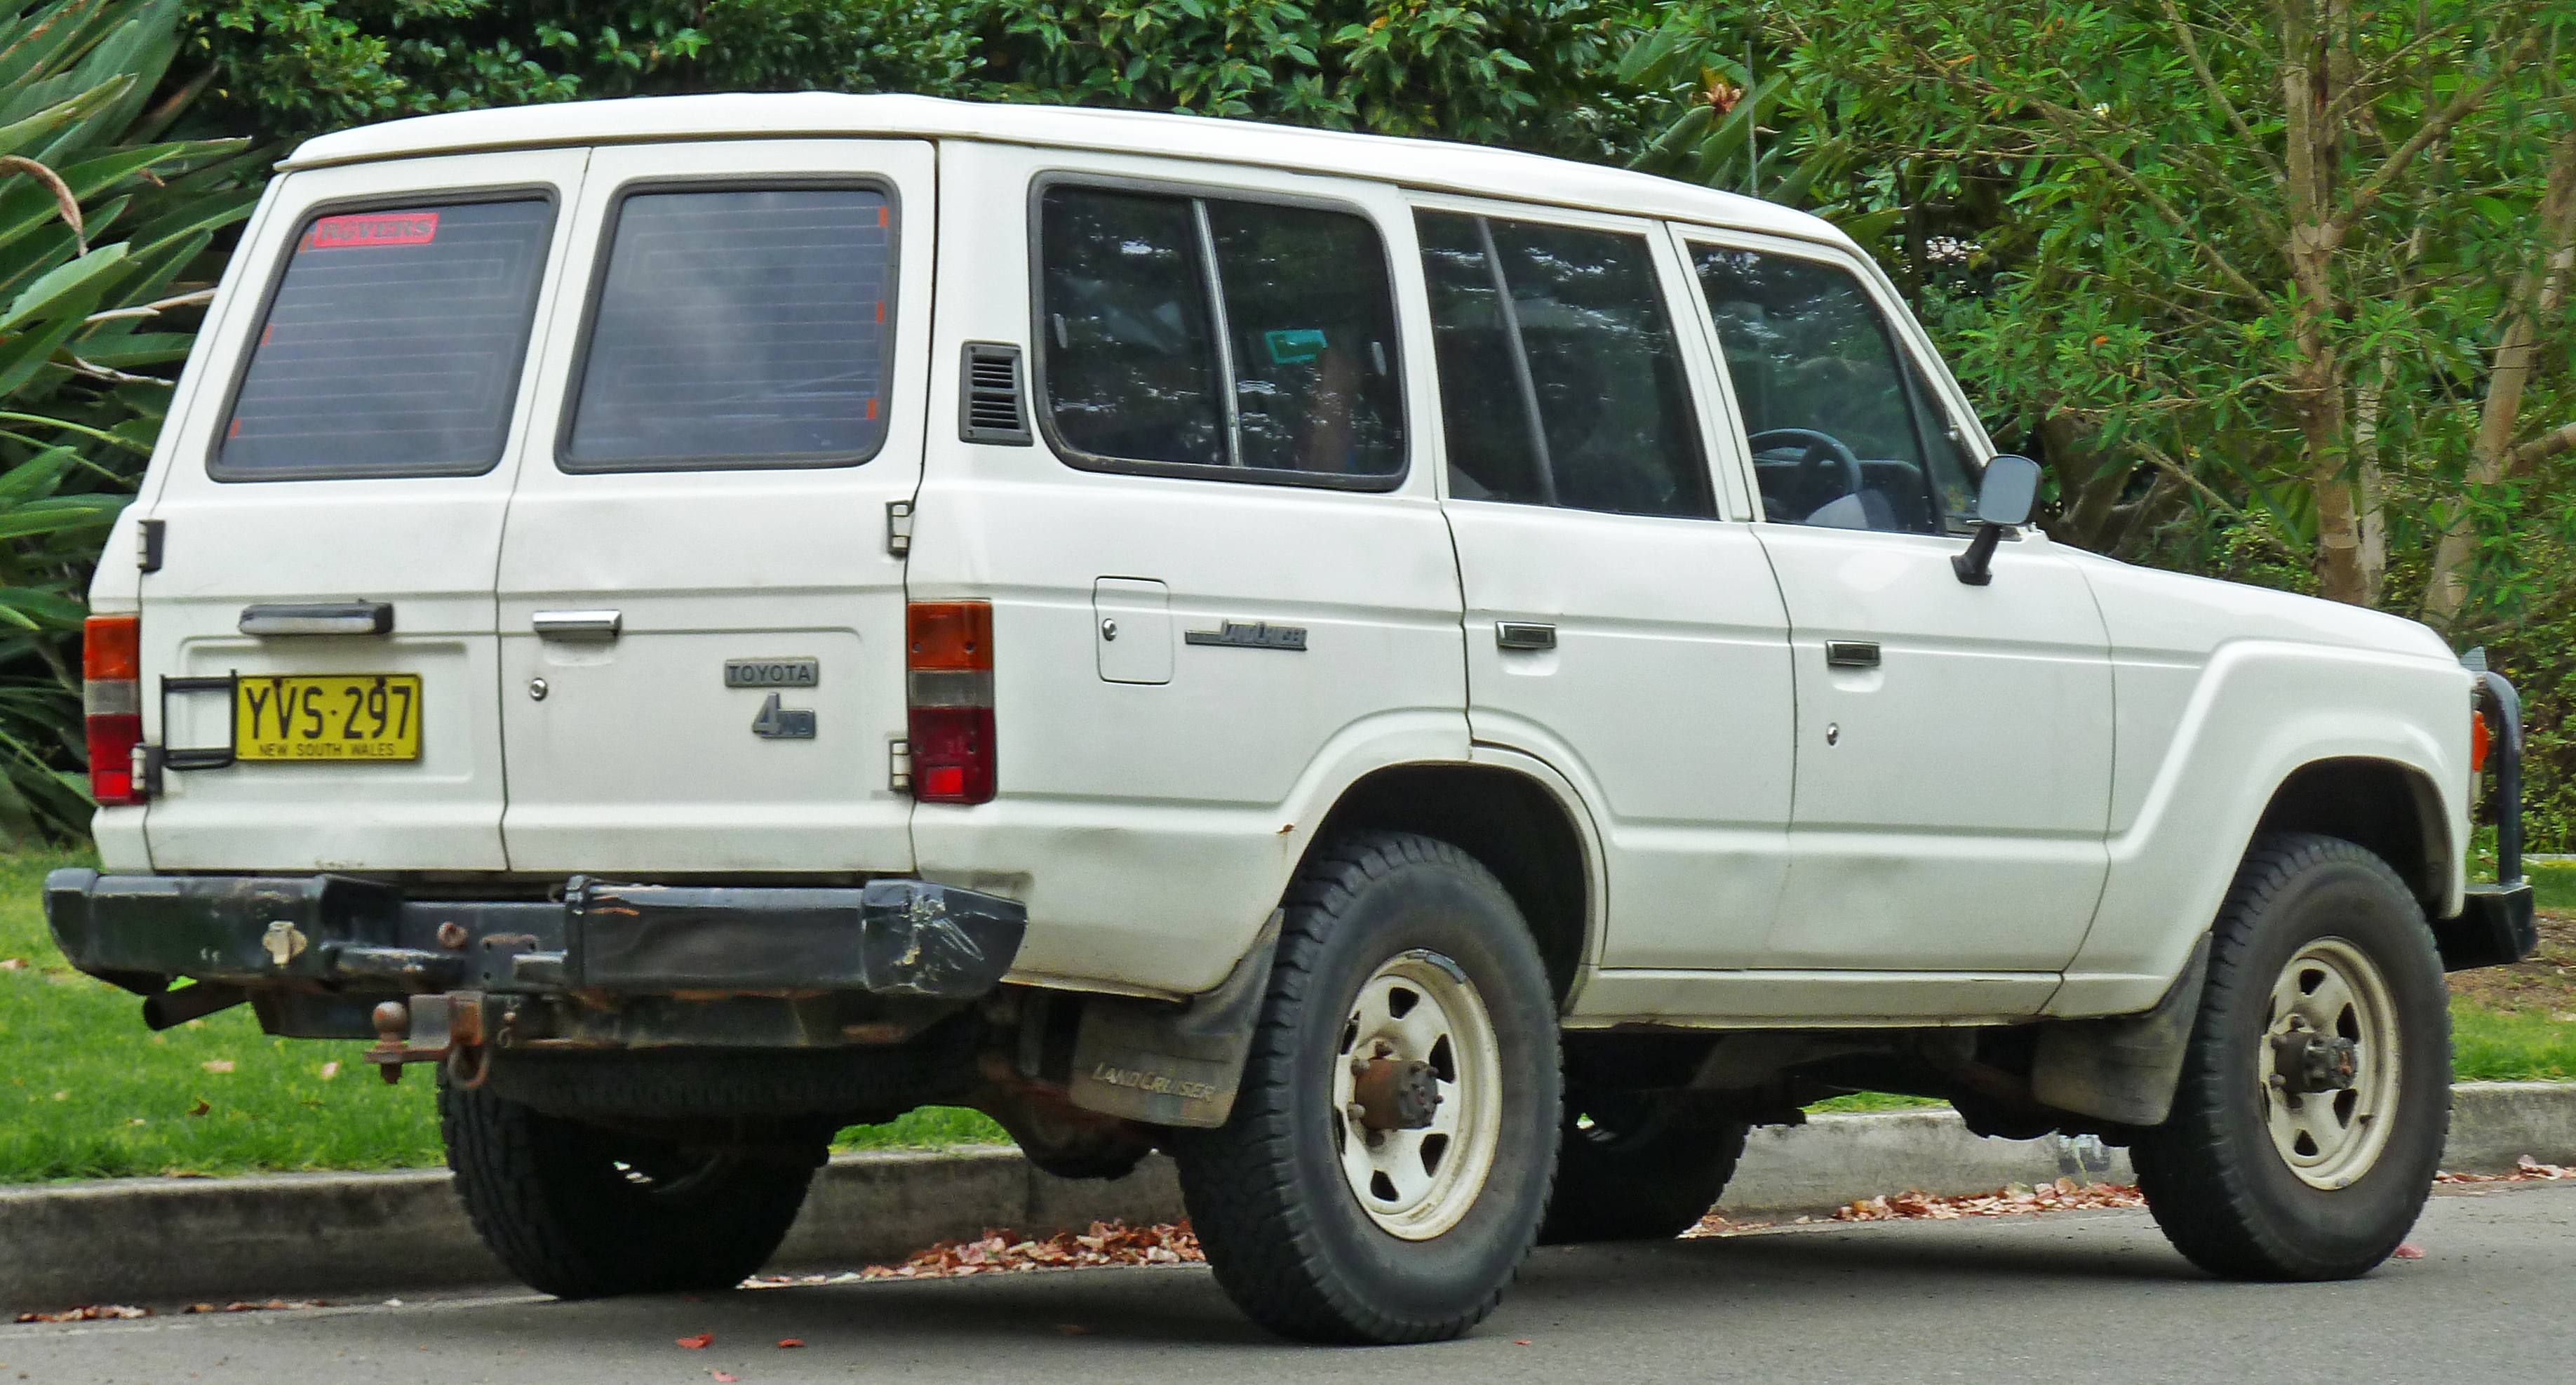 Toyota Land Cruiser Wiki >> File:1981-1987 Toyota Land Cruiser (FJ60) wagon (2011-03-10).jpg - Wikimedia Commons